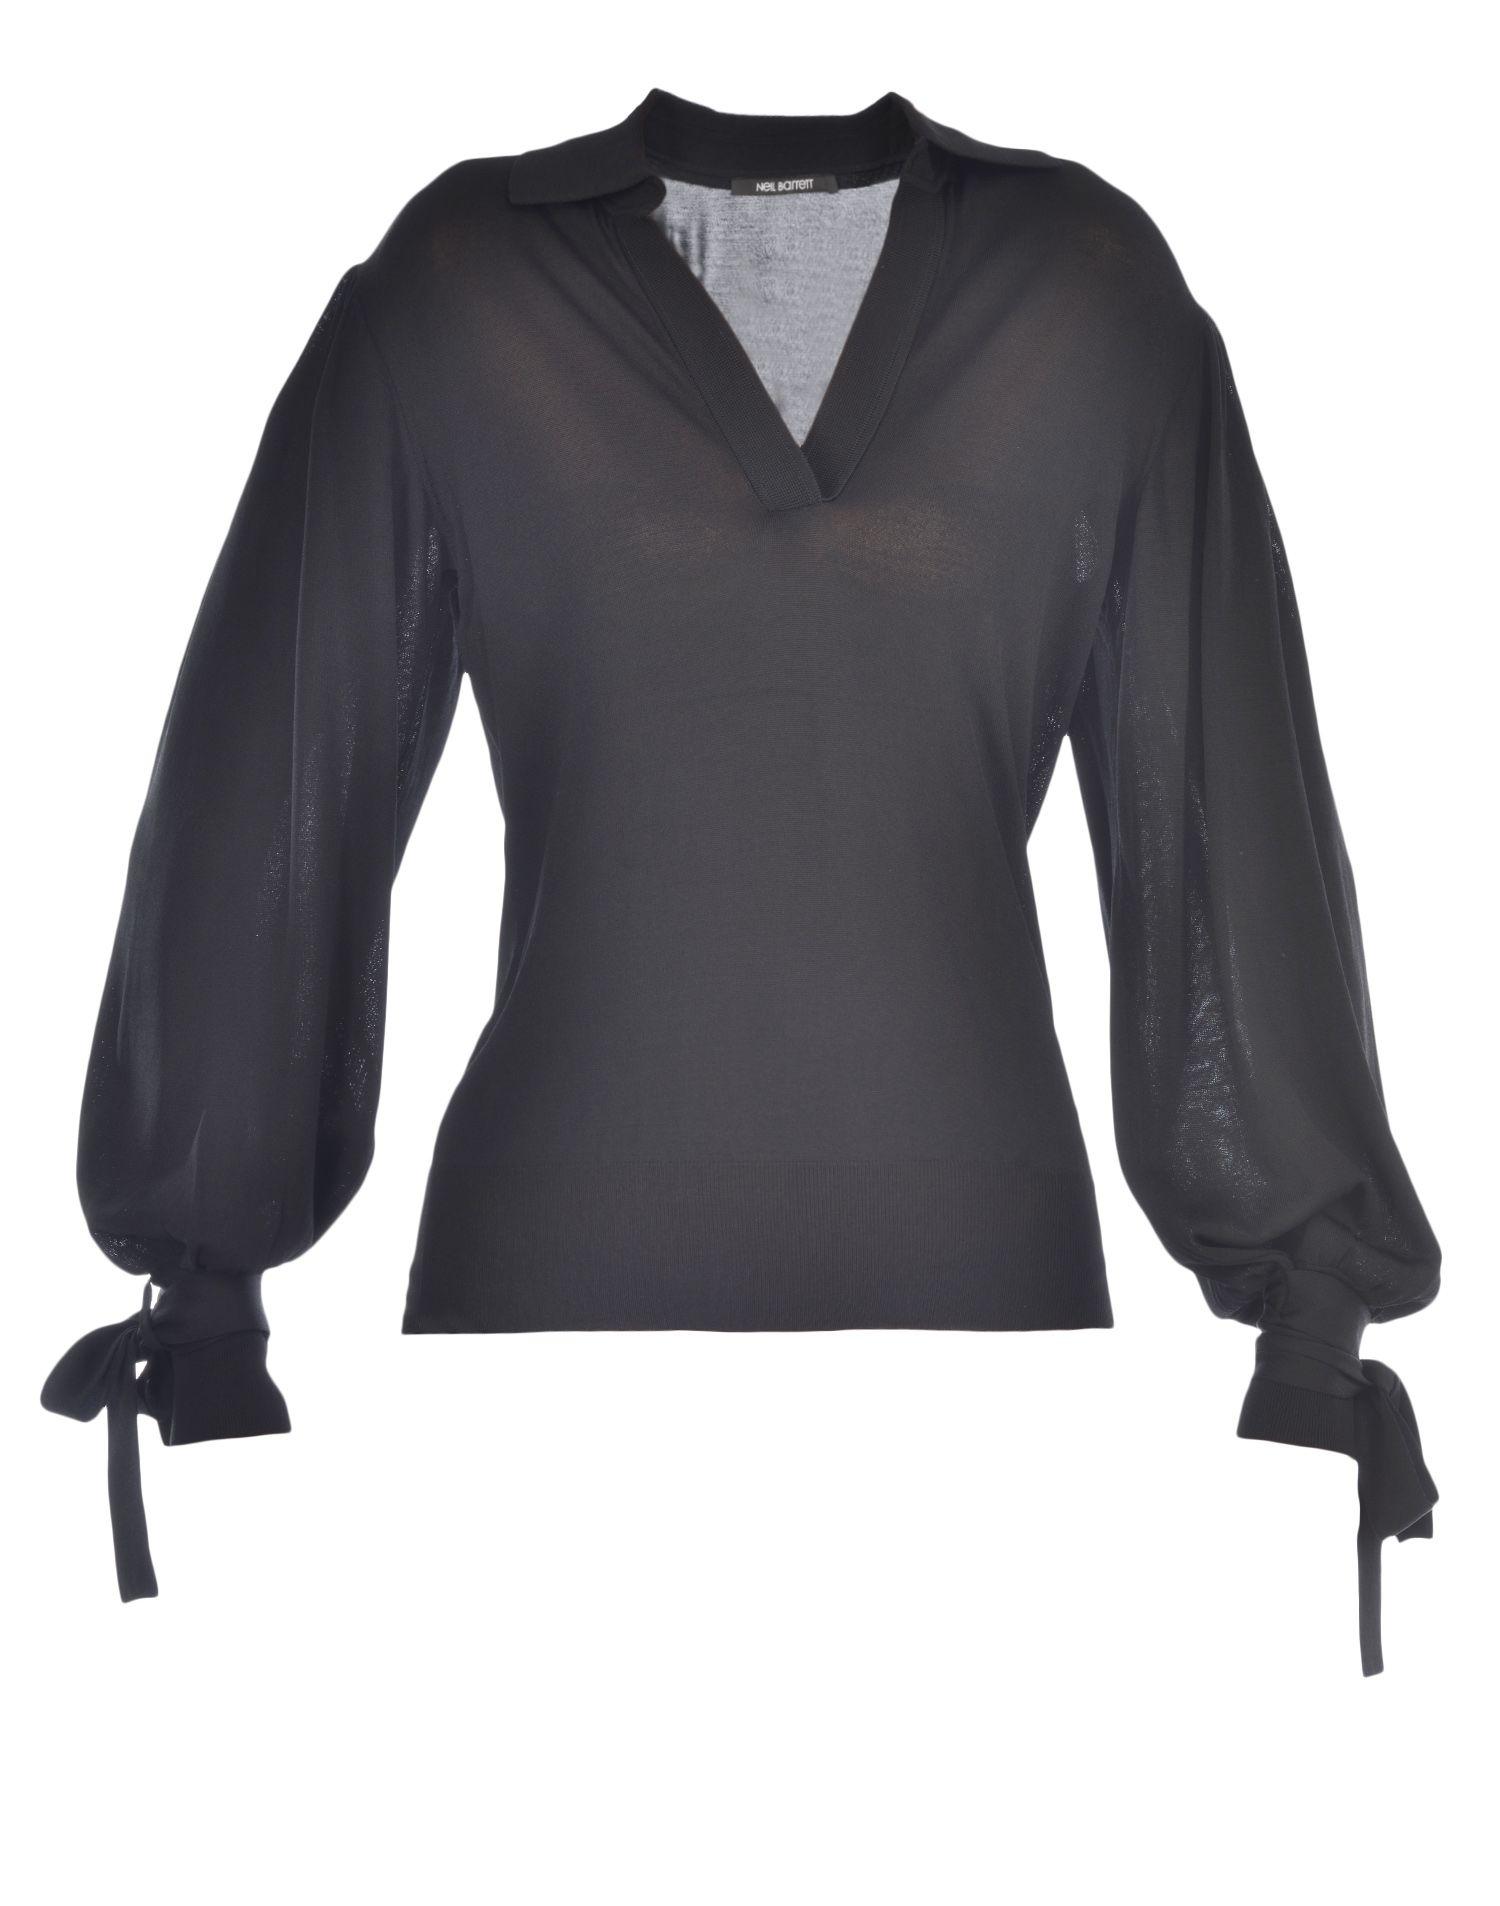 Neil Barrett Sheer Sweater